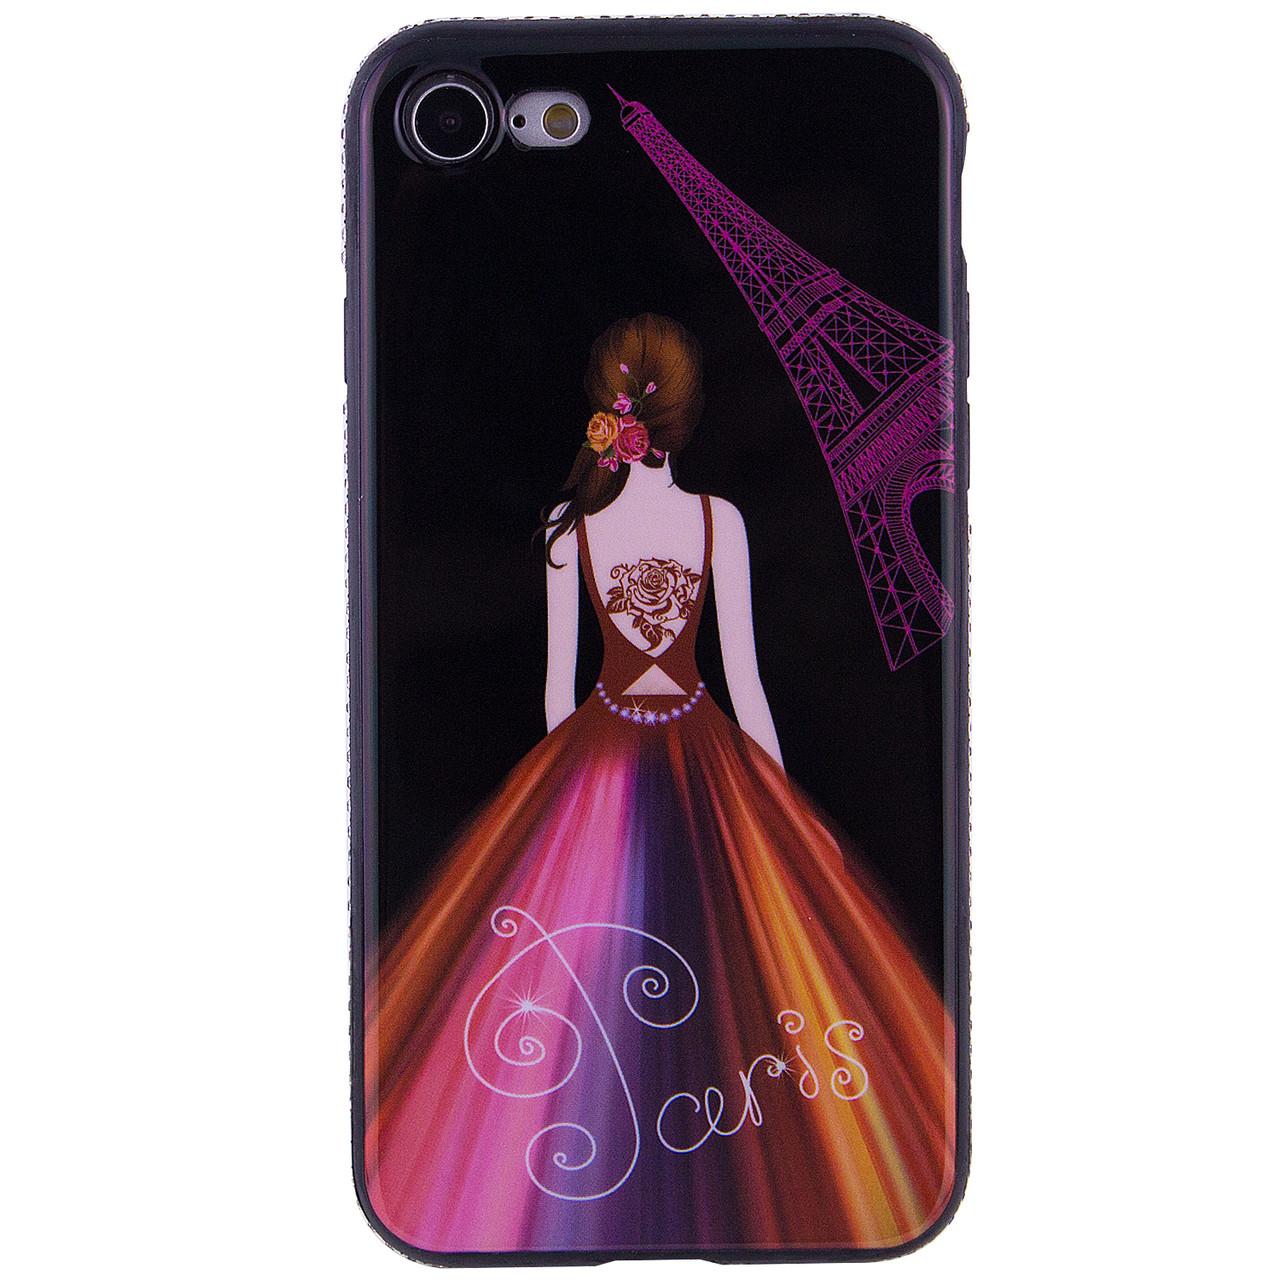 TPU чехол Magic Girl со стразами для Apple iPhone 7 / 8 (4.7